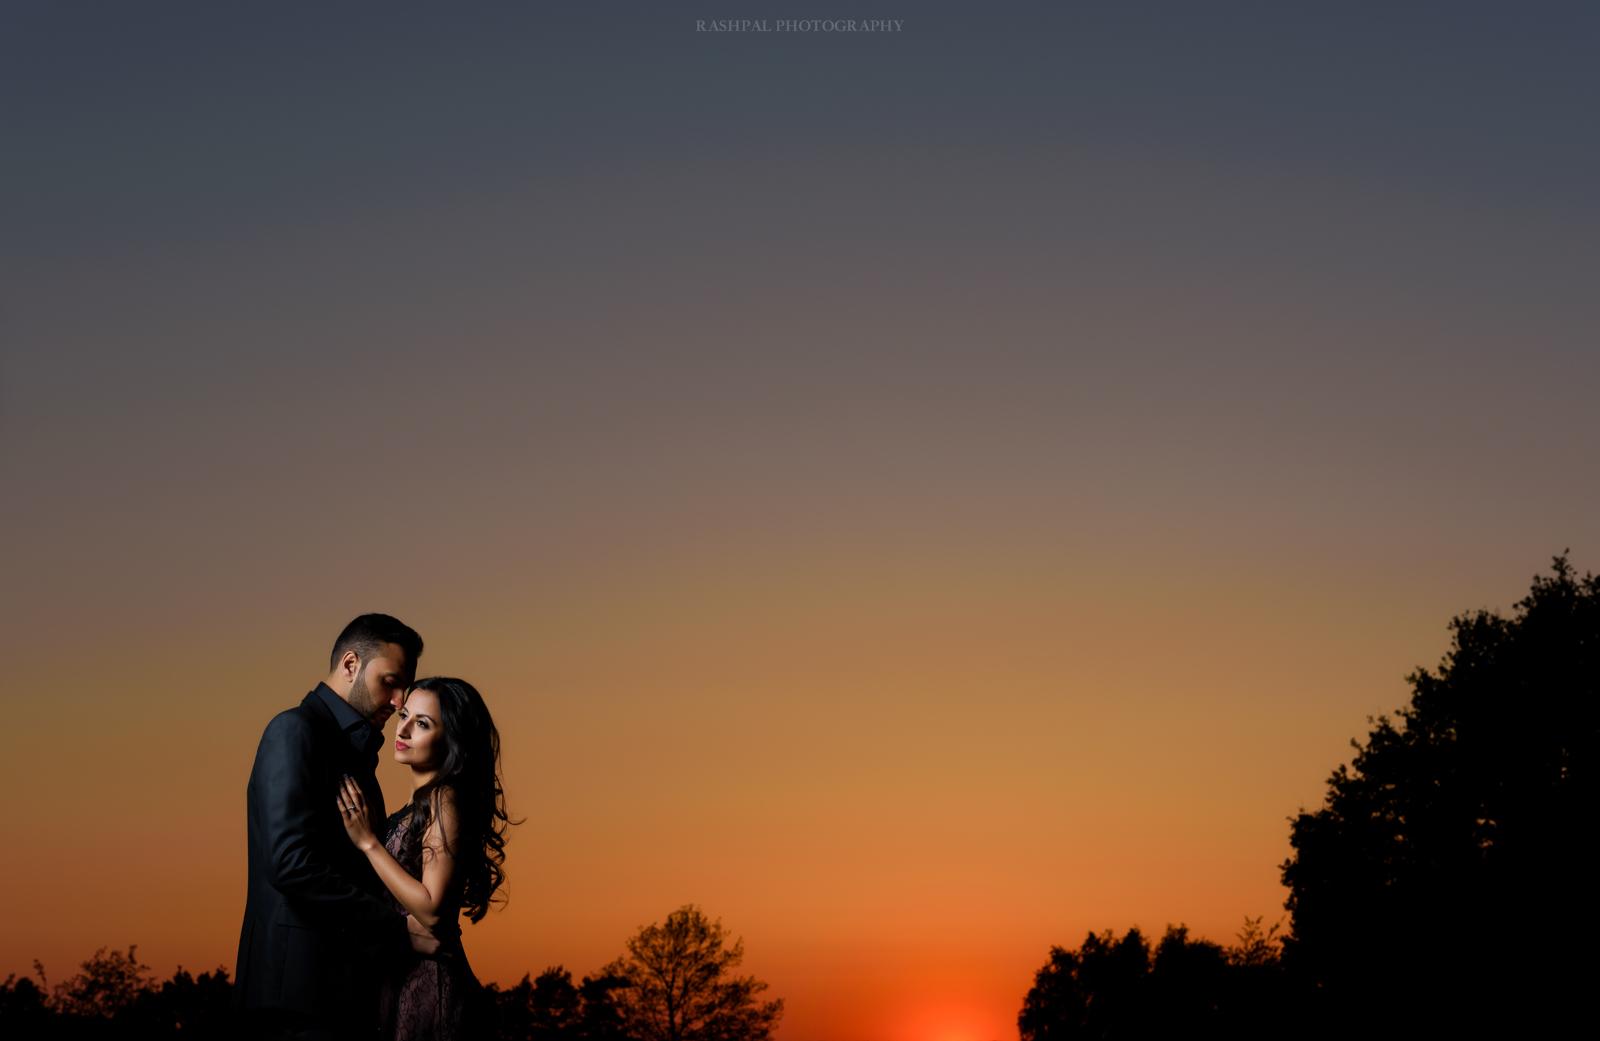 www.Rashpal-Photography.com